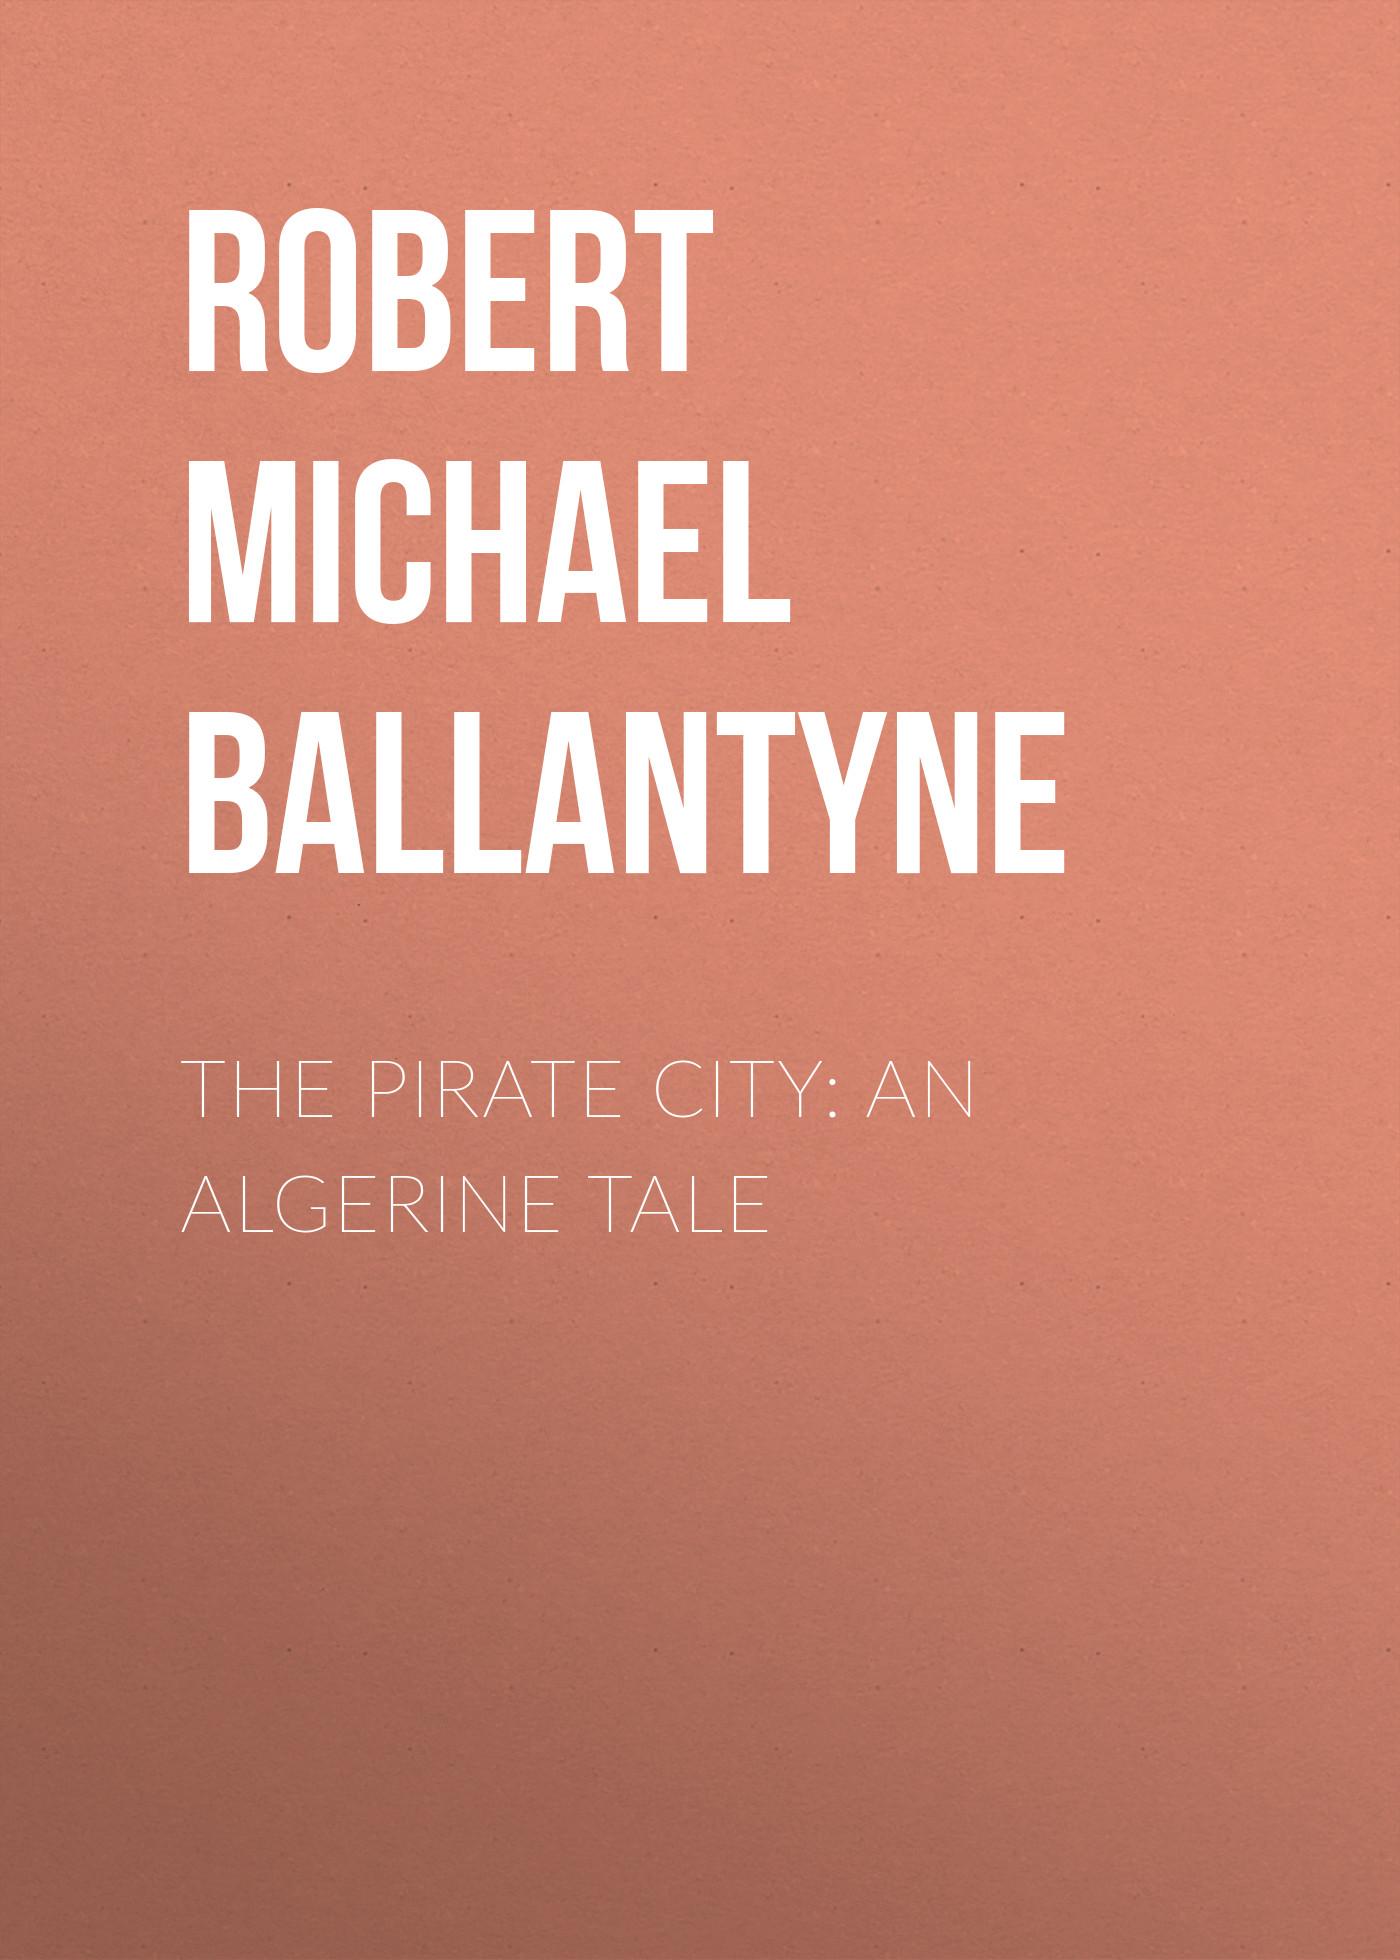 Robert Michael Ballantyne The Pirate City: An Algerine Tale